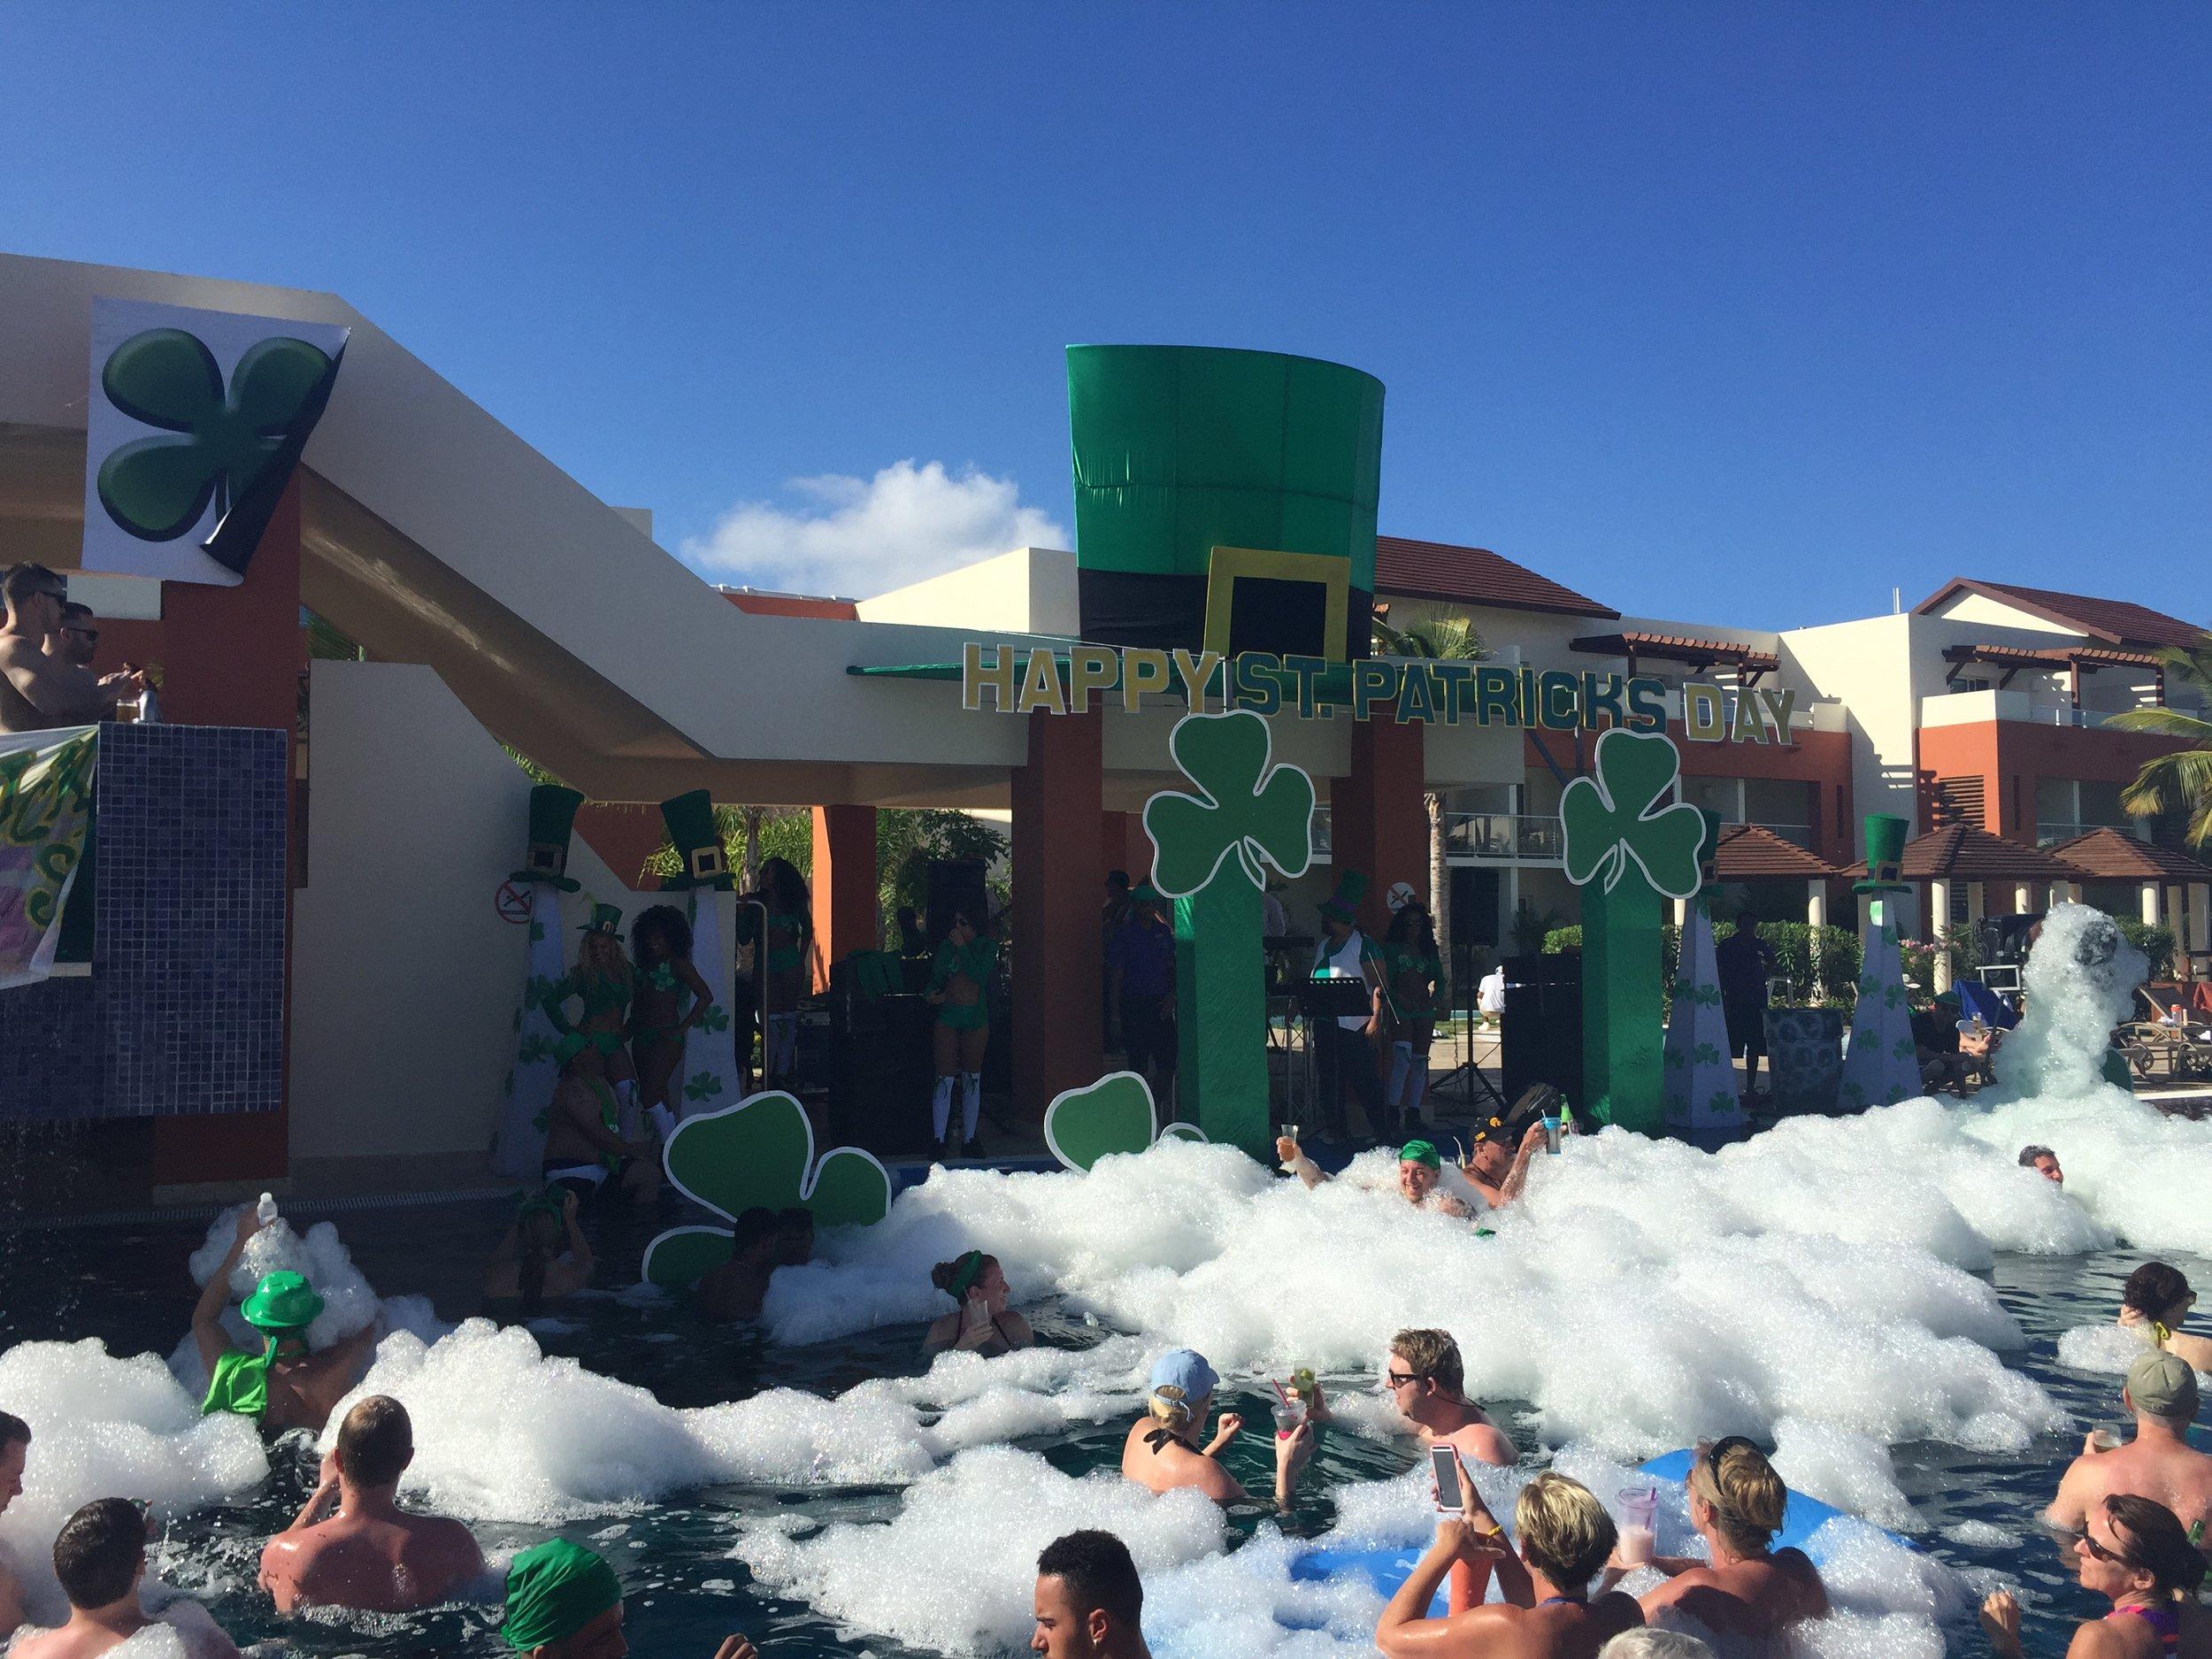 The regular foam parties were lots of fun!